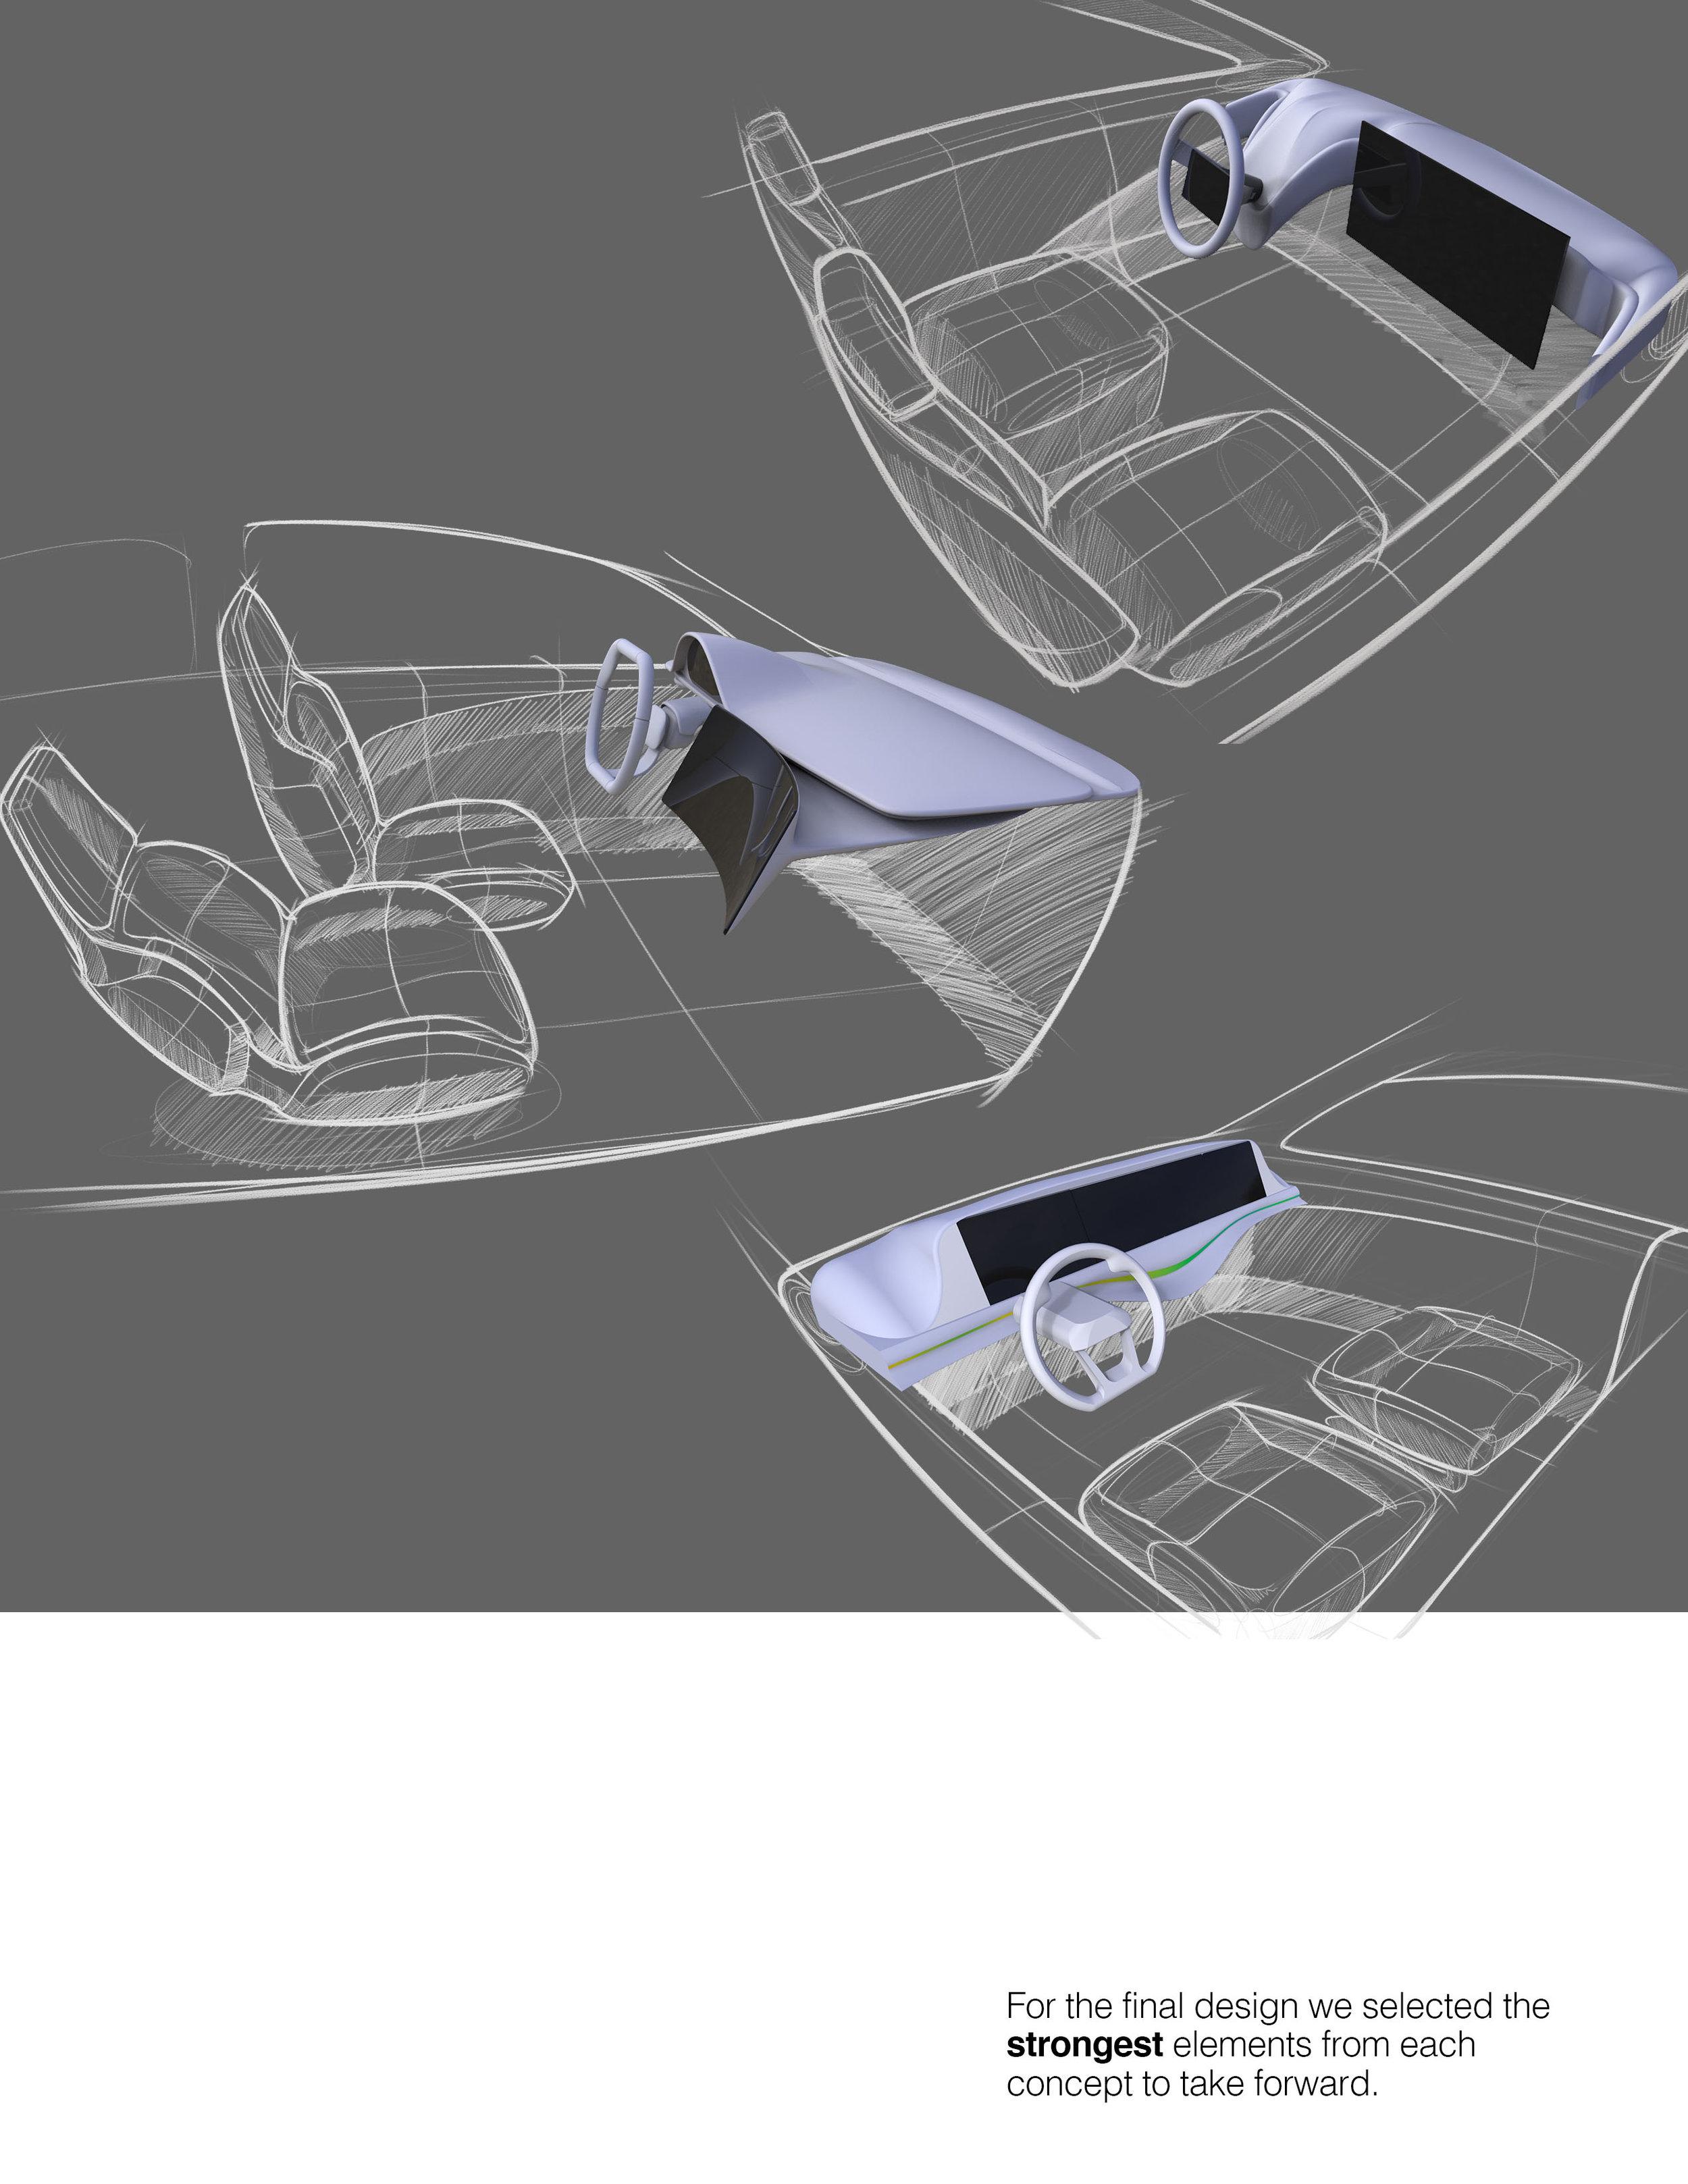 SamsungProjectArtboard 1 copy 22.jpg